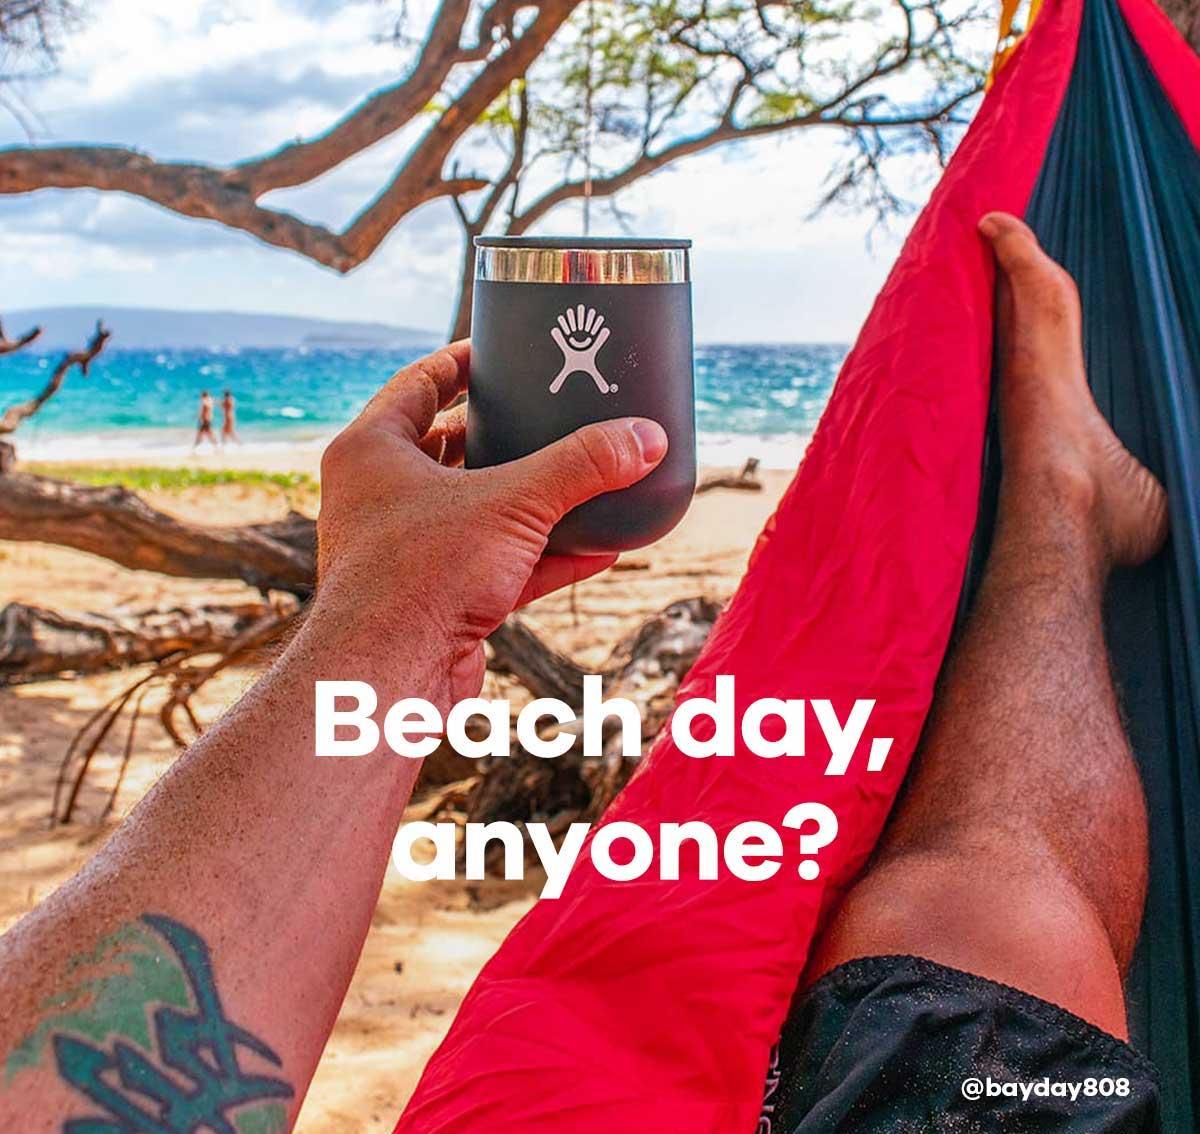 Beach day, anyone? - @bayday808